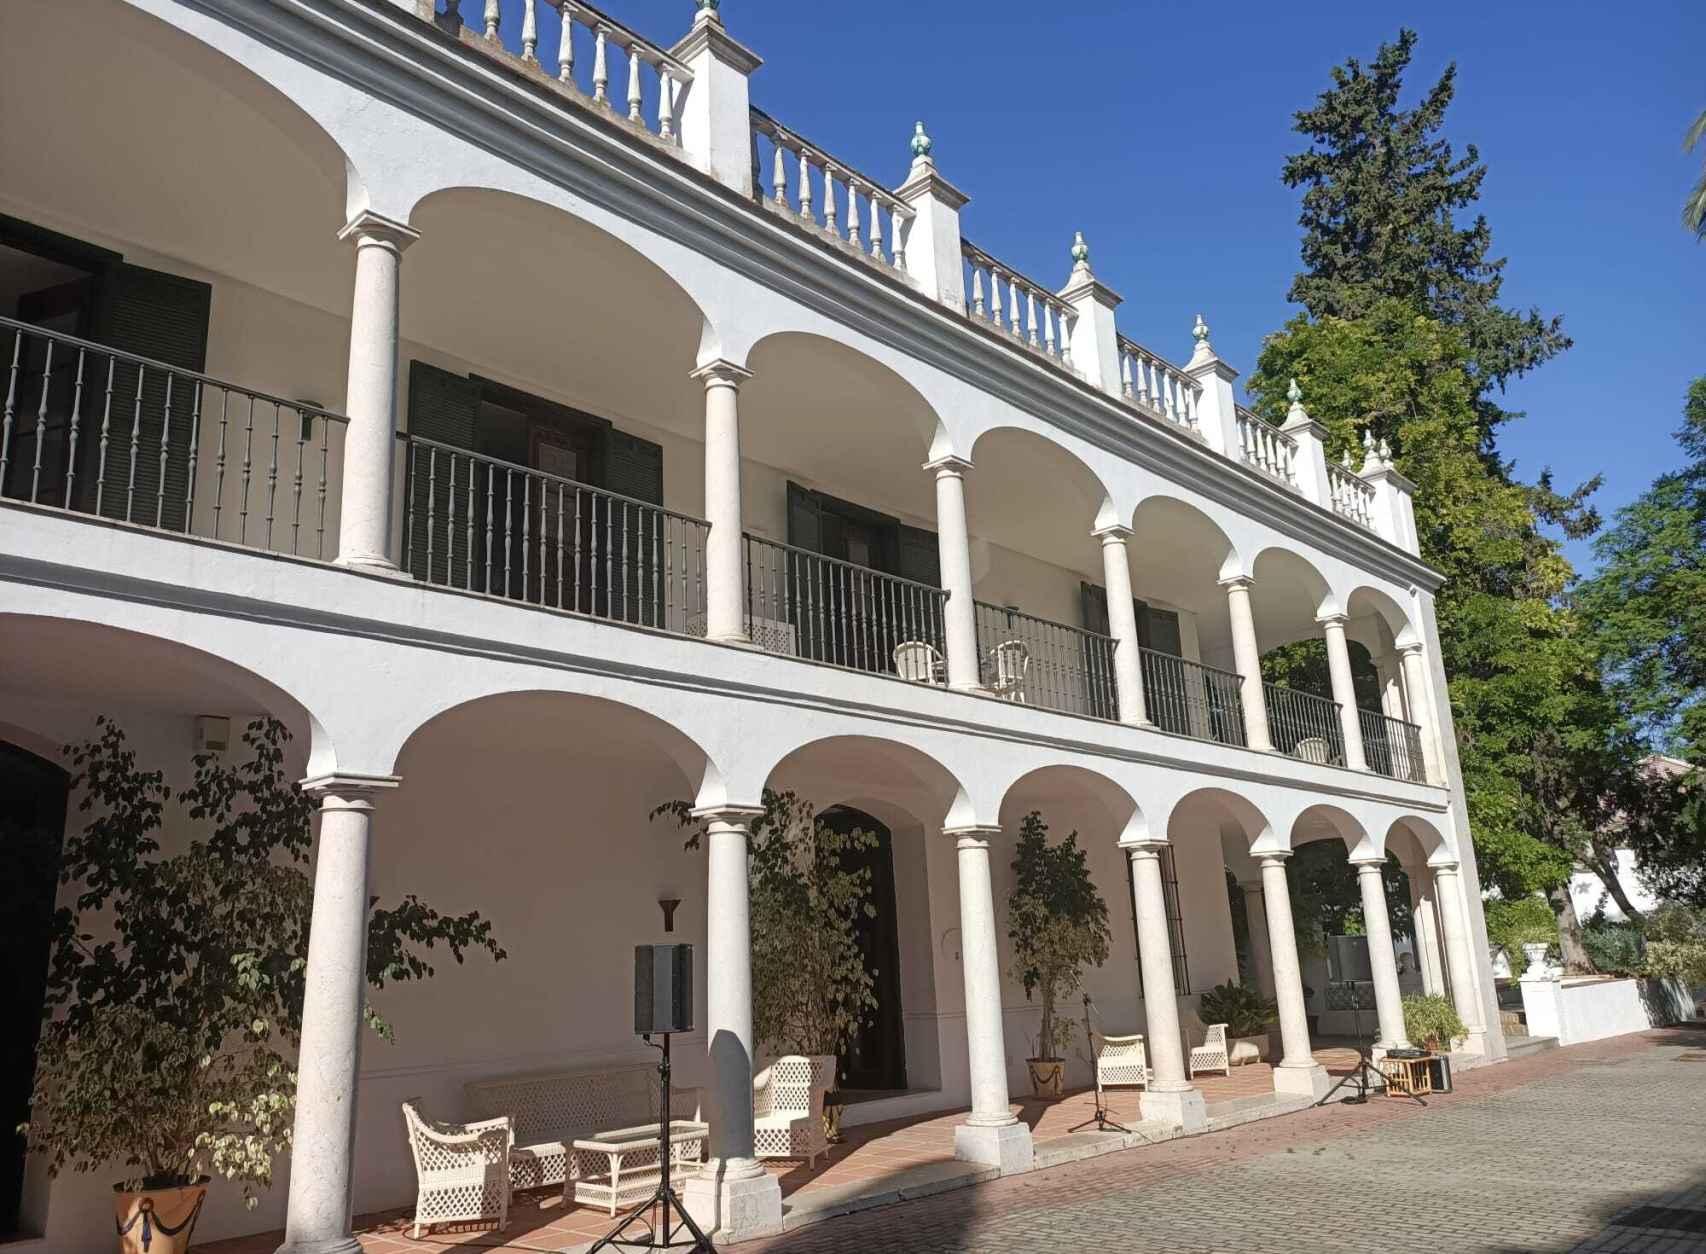 La finca de Churriana donde estuvo Hemingway.